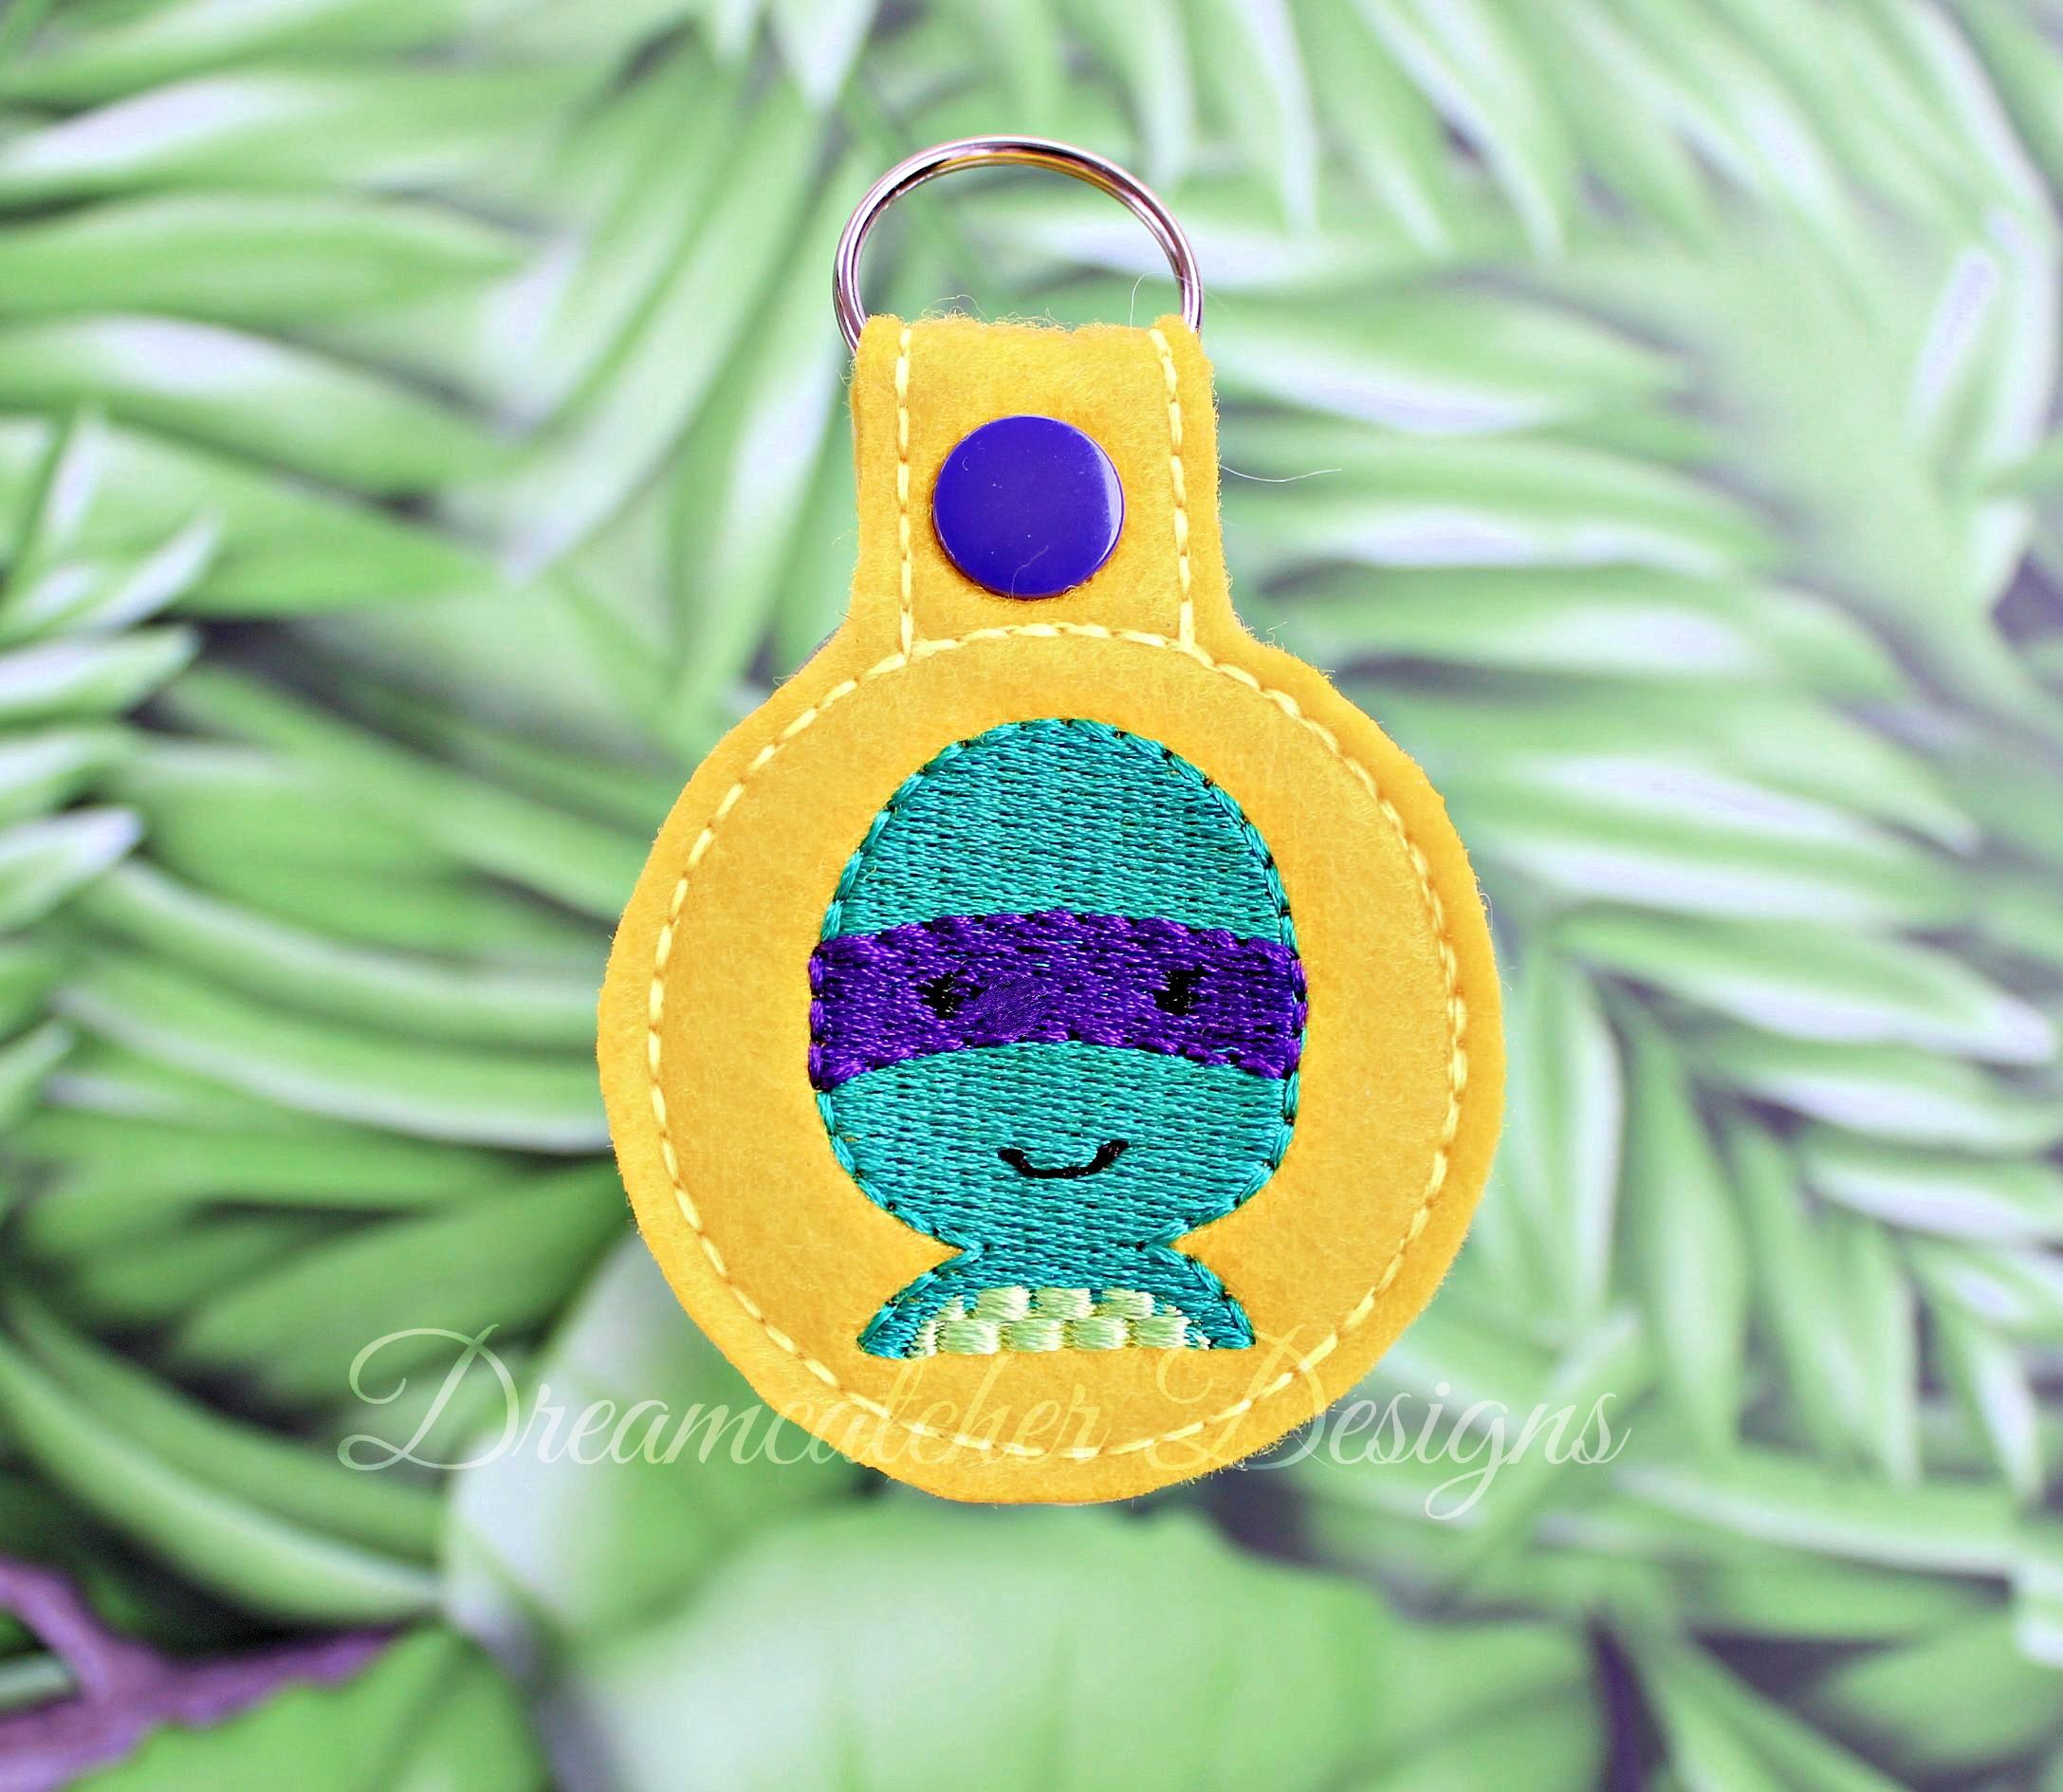 In The Hoop Turtle Hero Key Fob Keychain Felt Embroidery Design